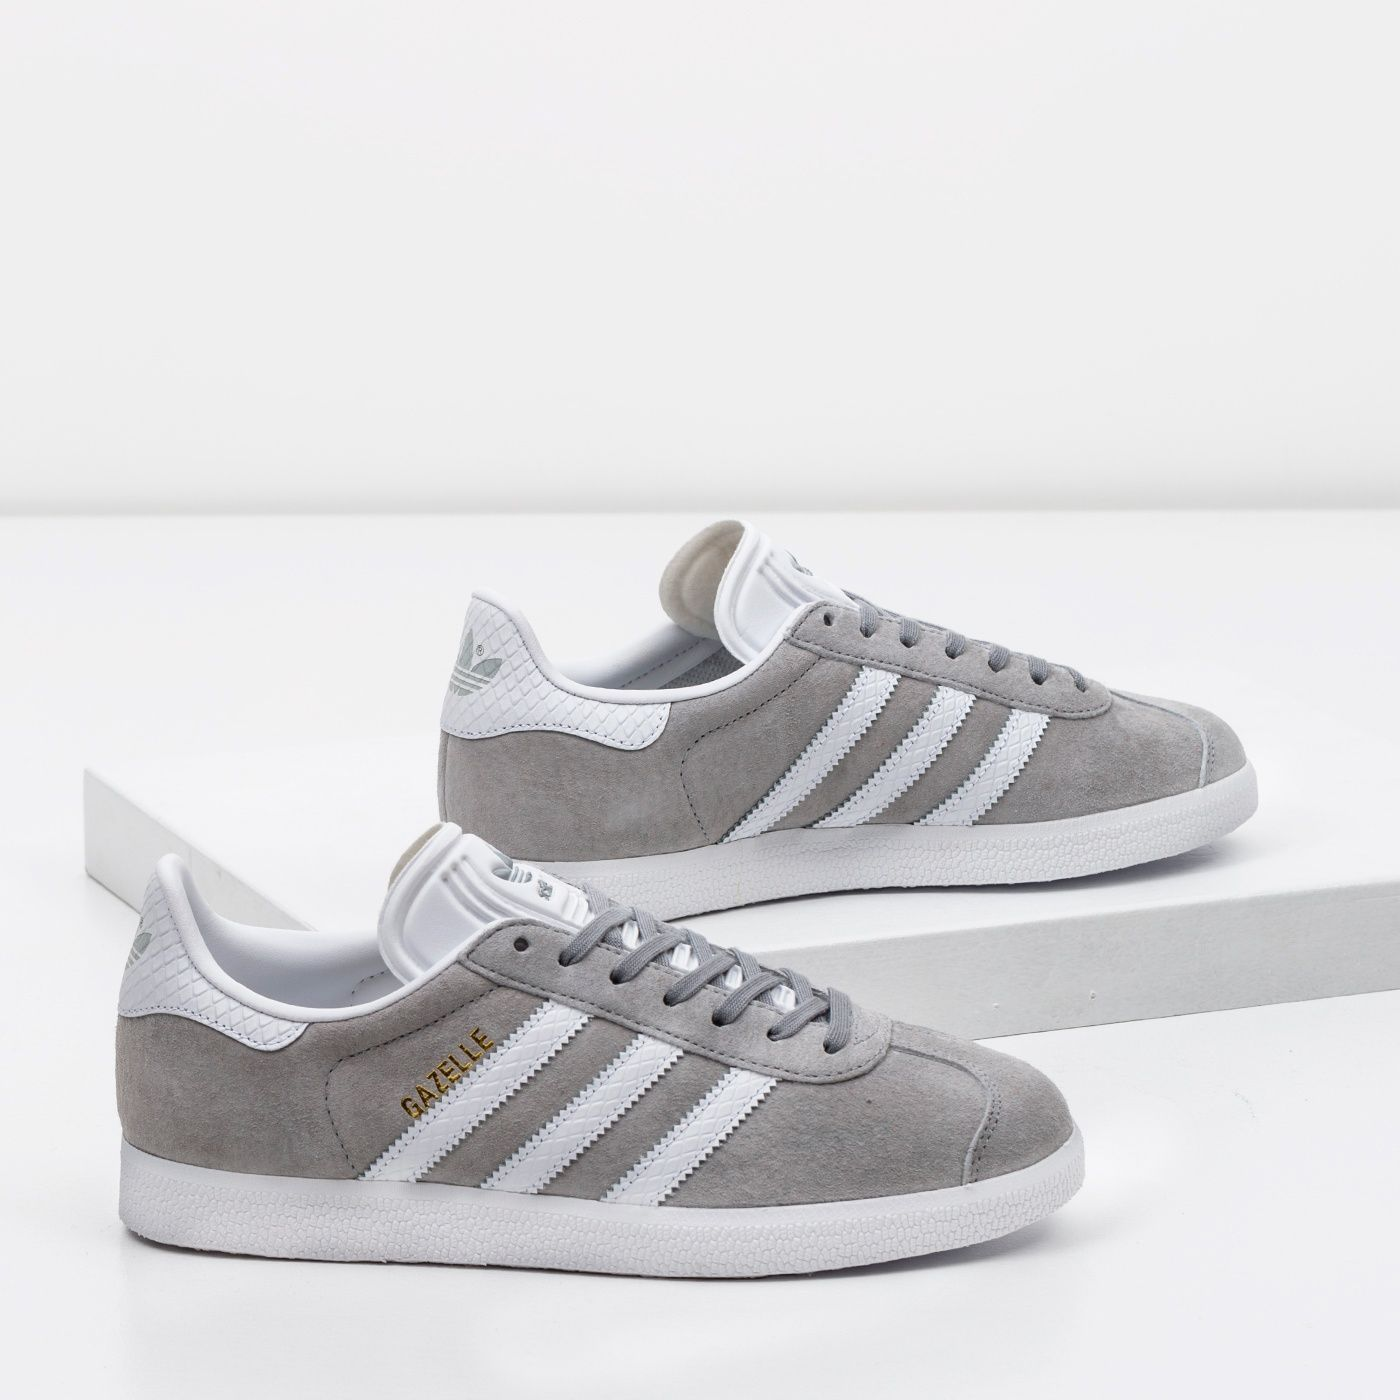 Adidas Nmd Auténtico herr